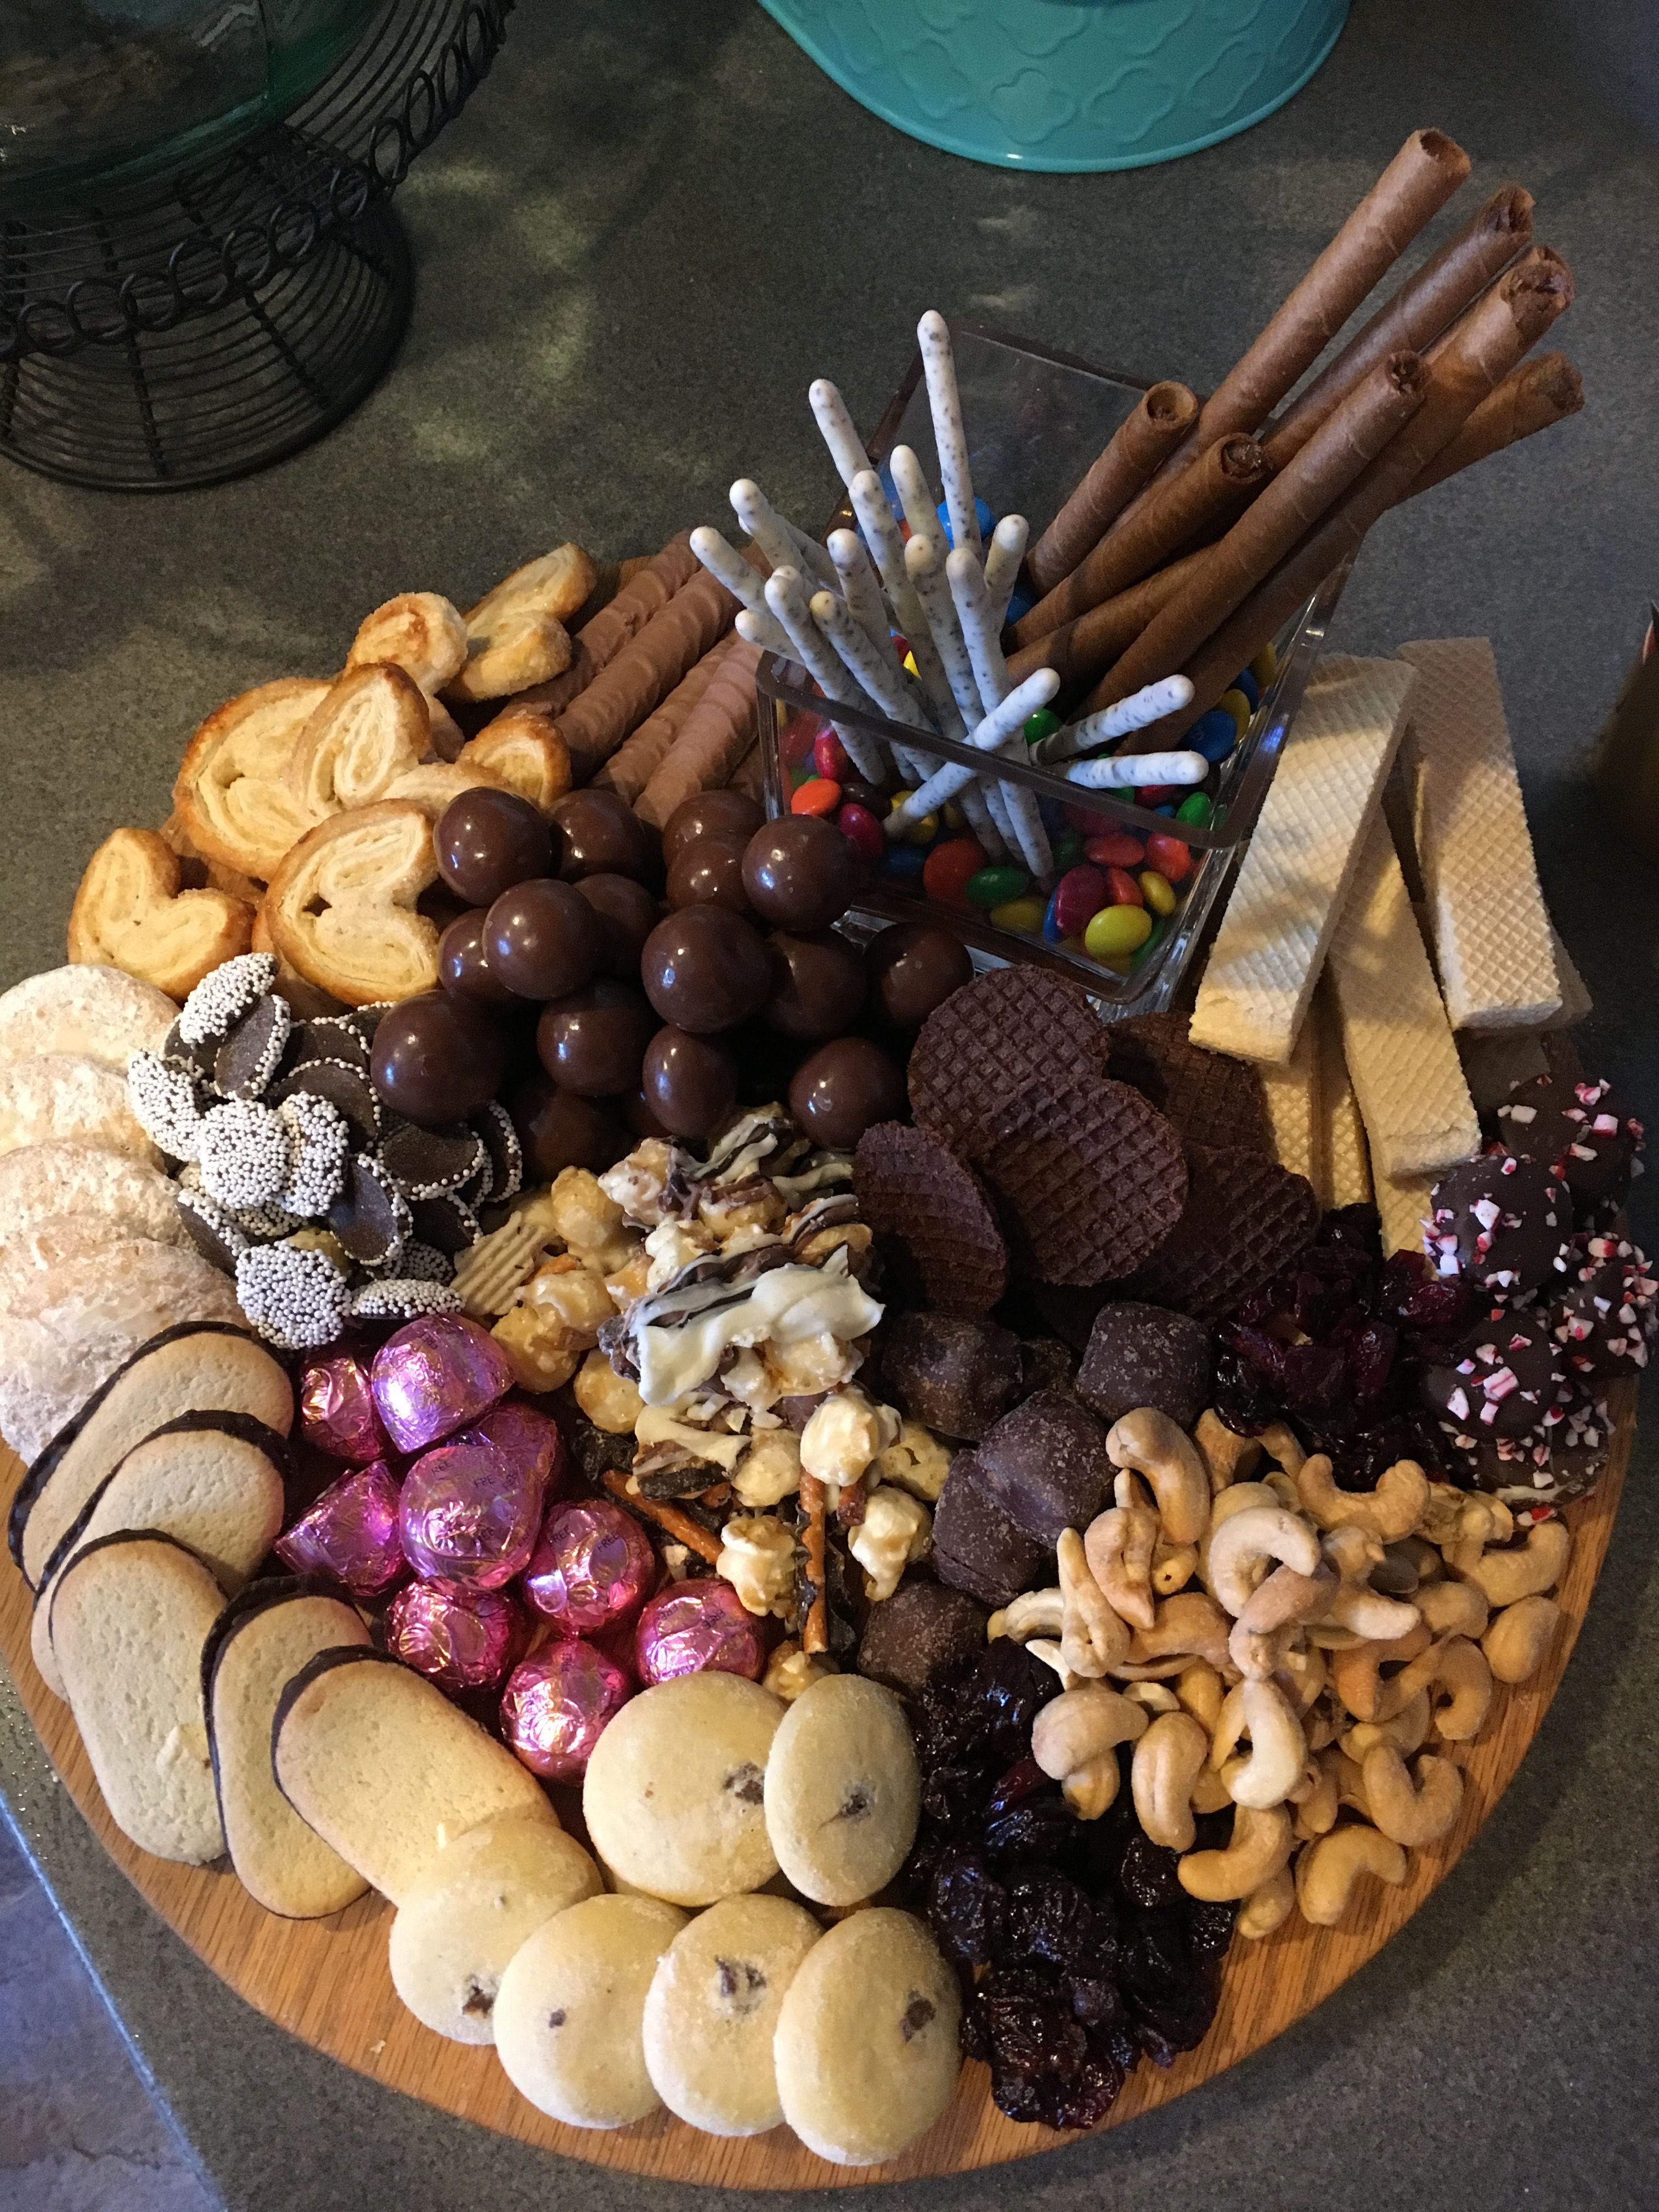 Chocolate Charcuterie Board #charcuterieboard